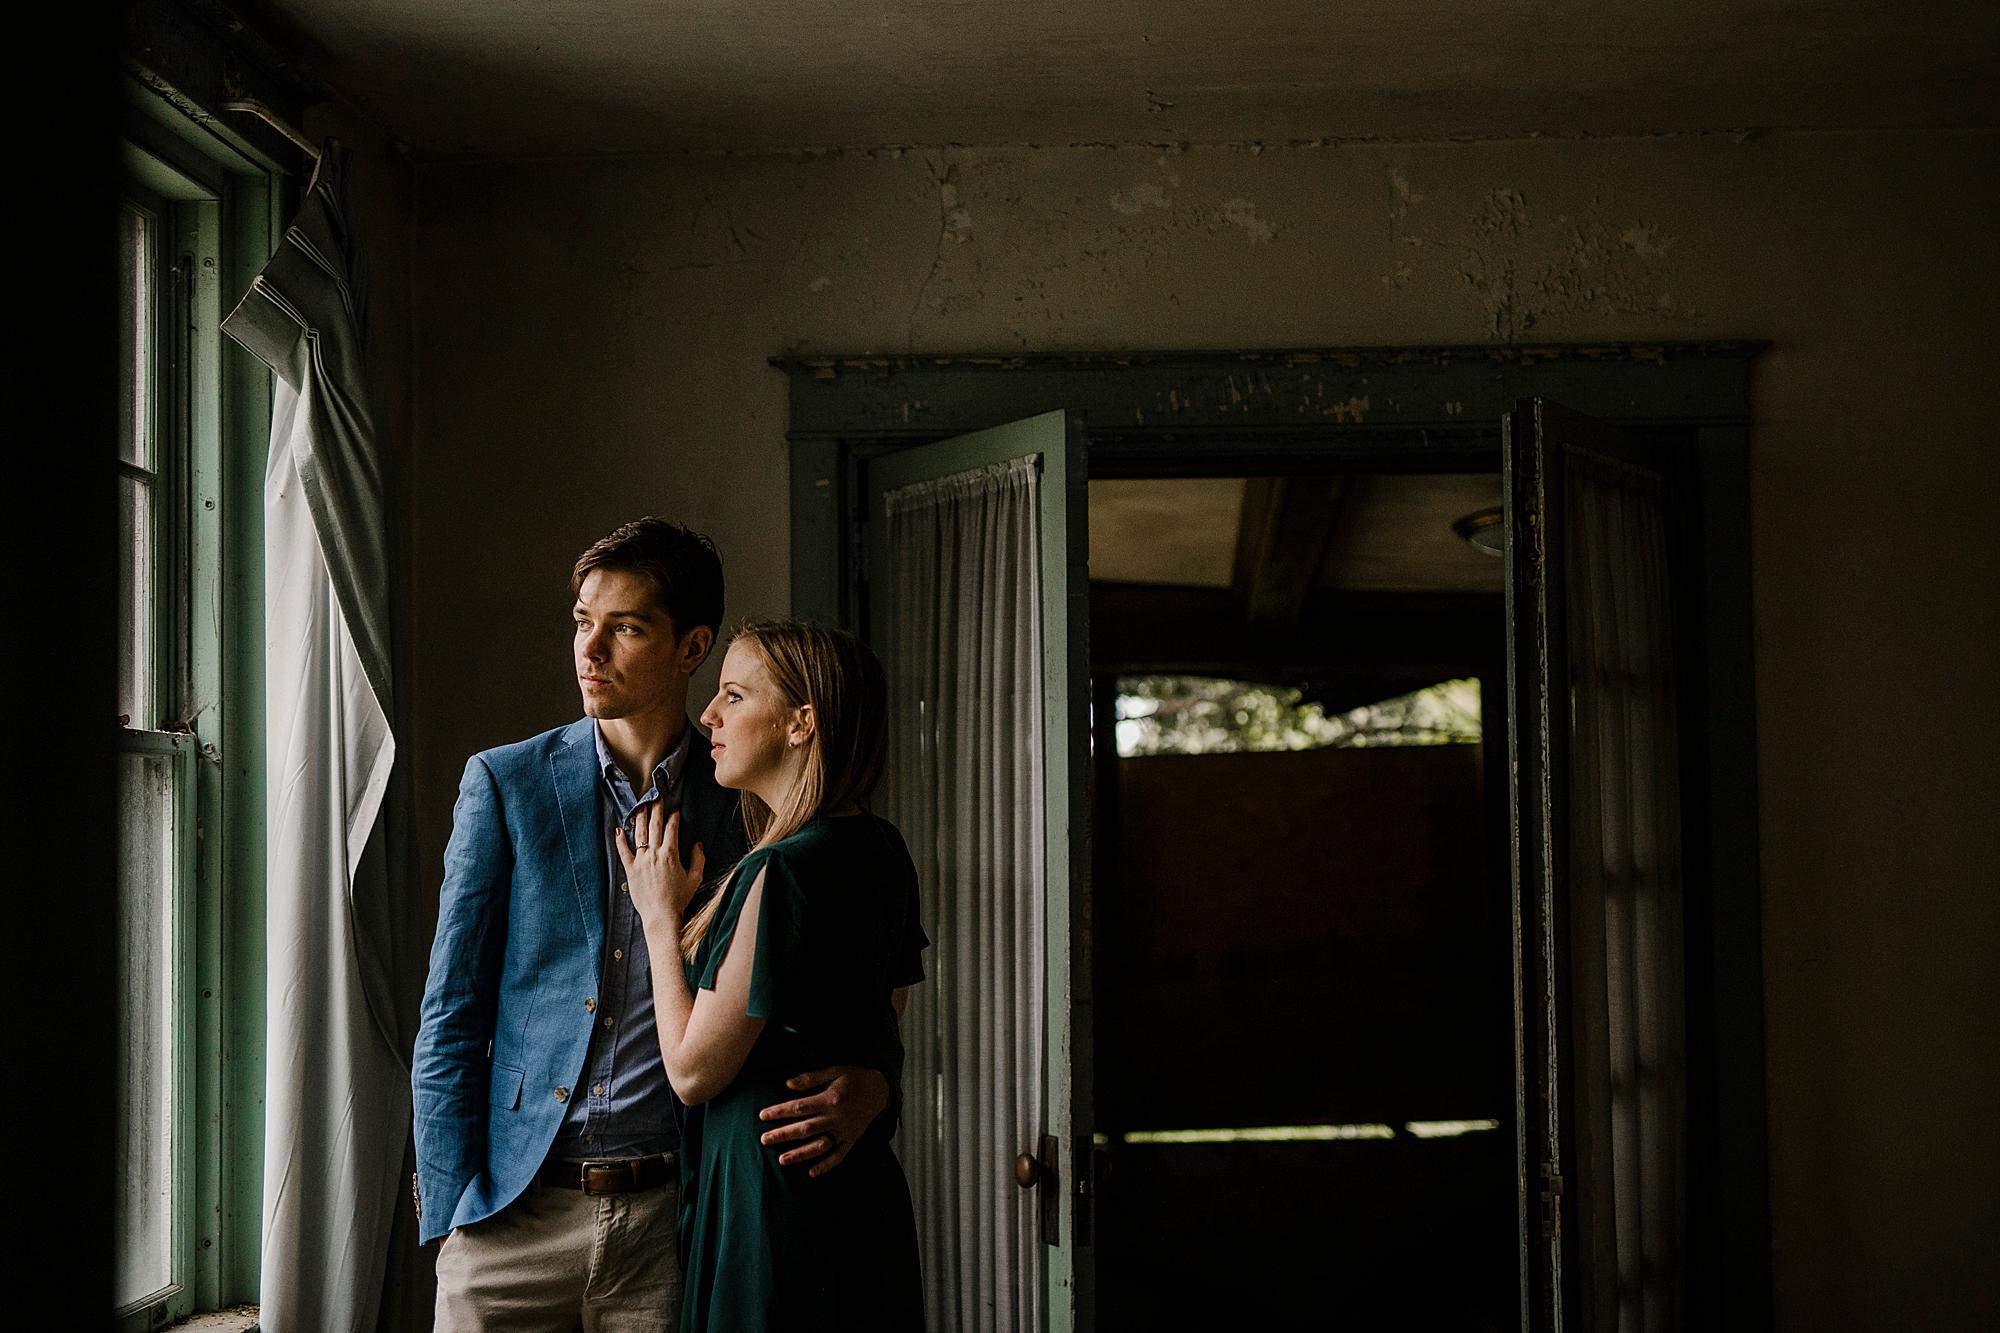 Tori_Zack_Glen_Mills_Terrain Cafe_Wedding_Engagement_Photography_Joe_Mac_Creative__0045.jpg